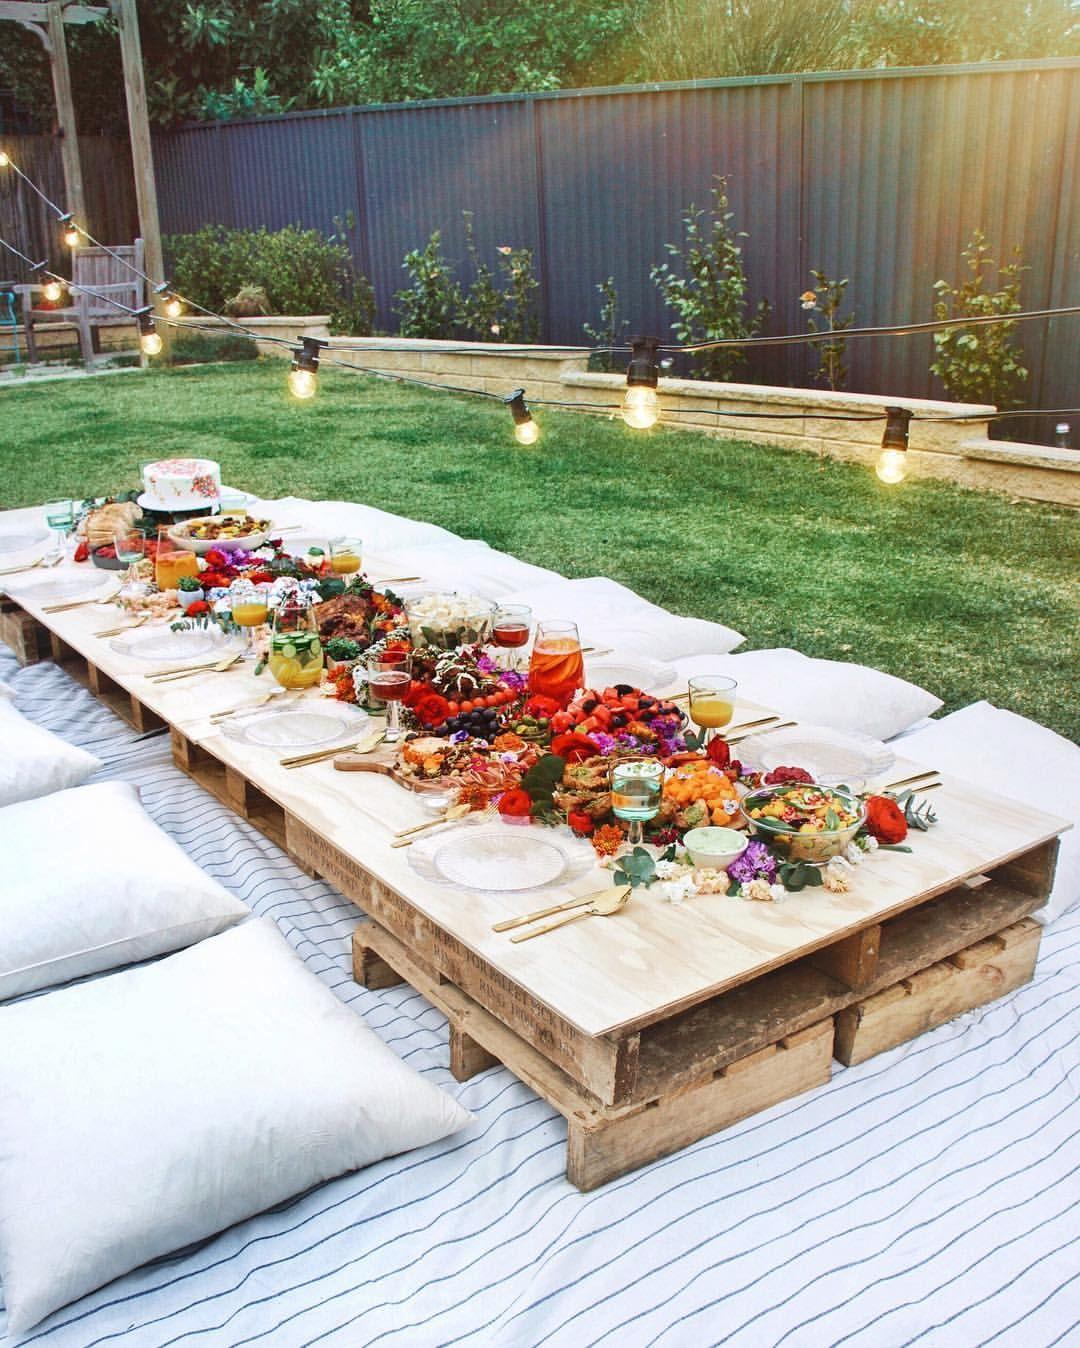 Summer Outdoor Wedding Decorations Ideas 12: See This Instagram Photo By @taramilktea • 36k Likes